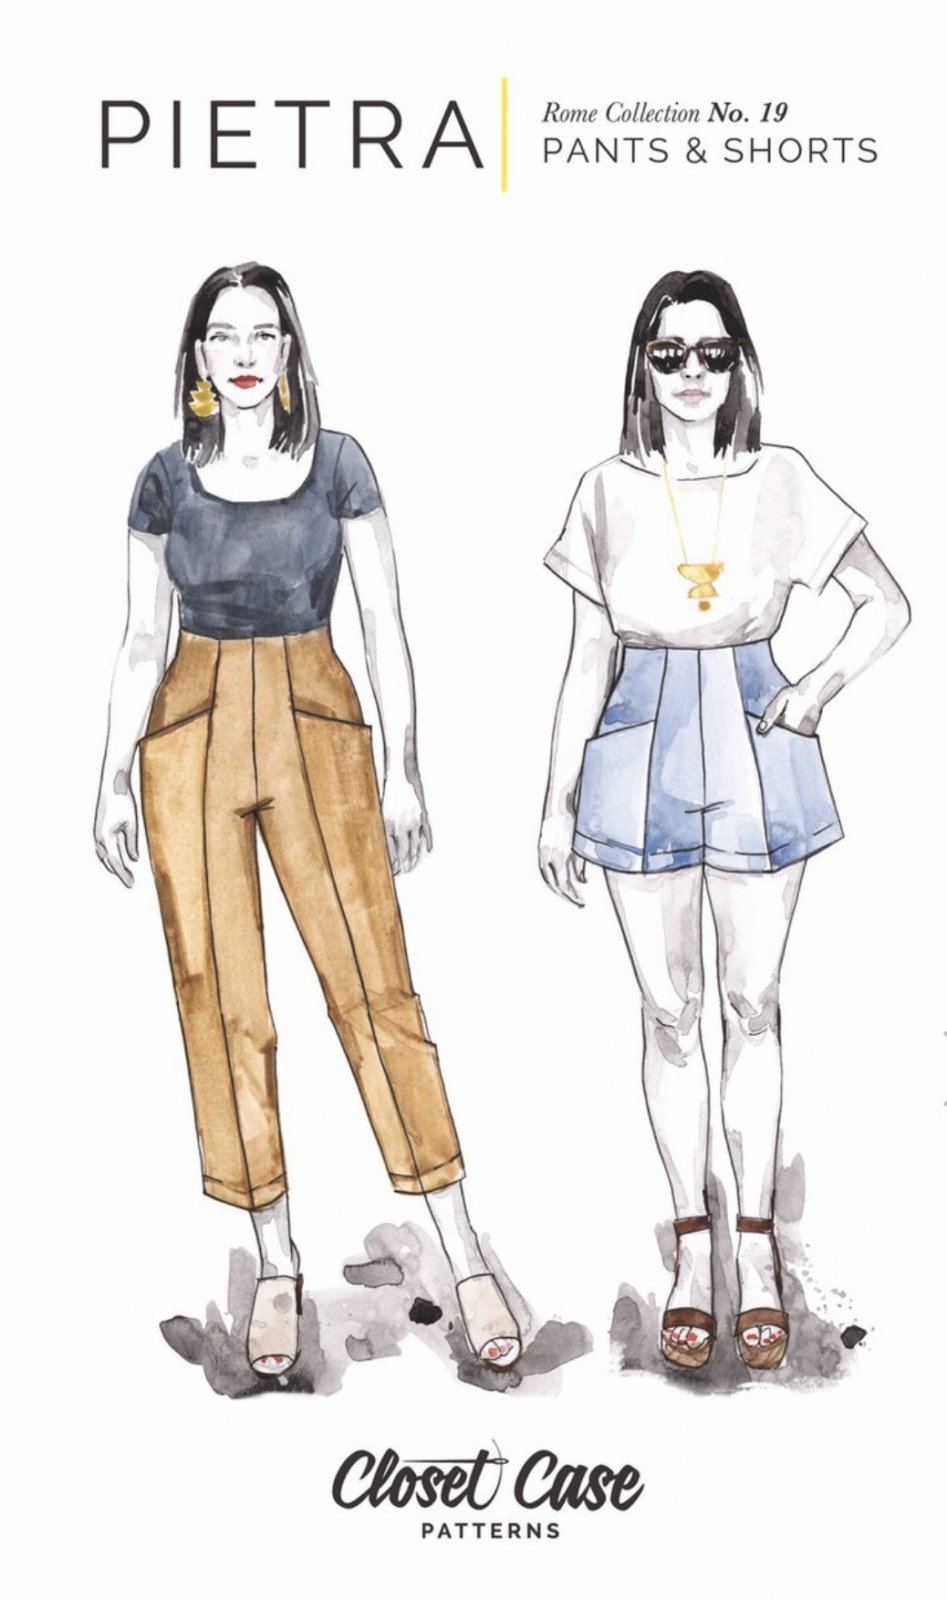 Closet Case - Pietra Pants & Shorts